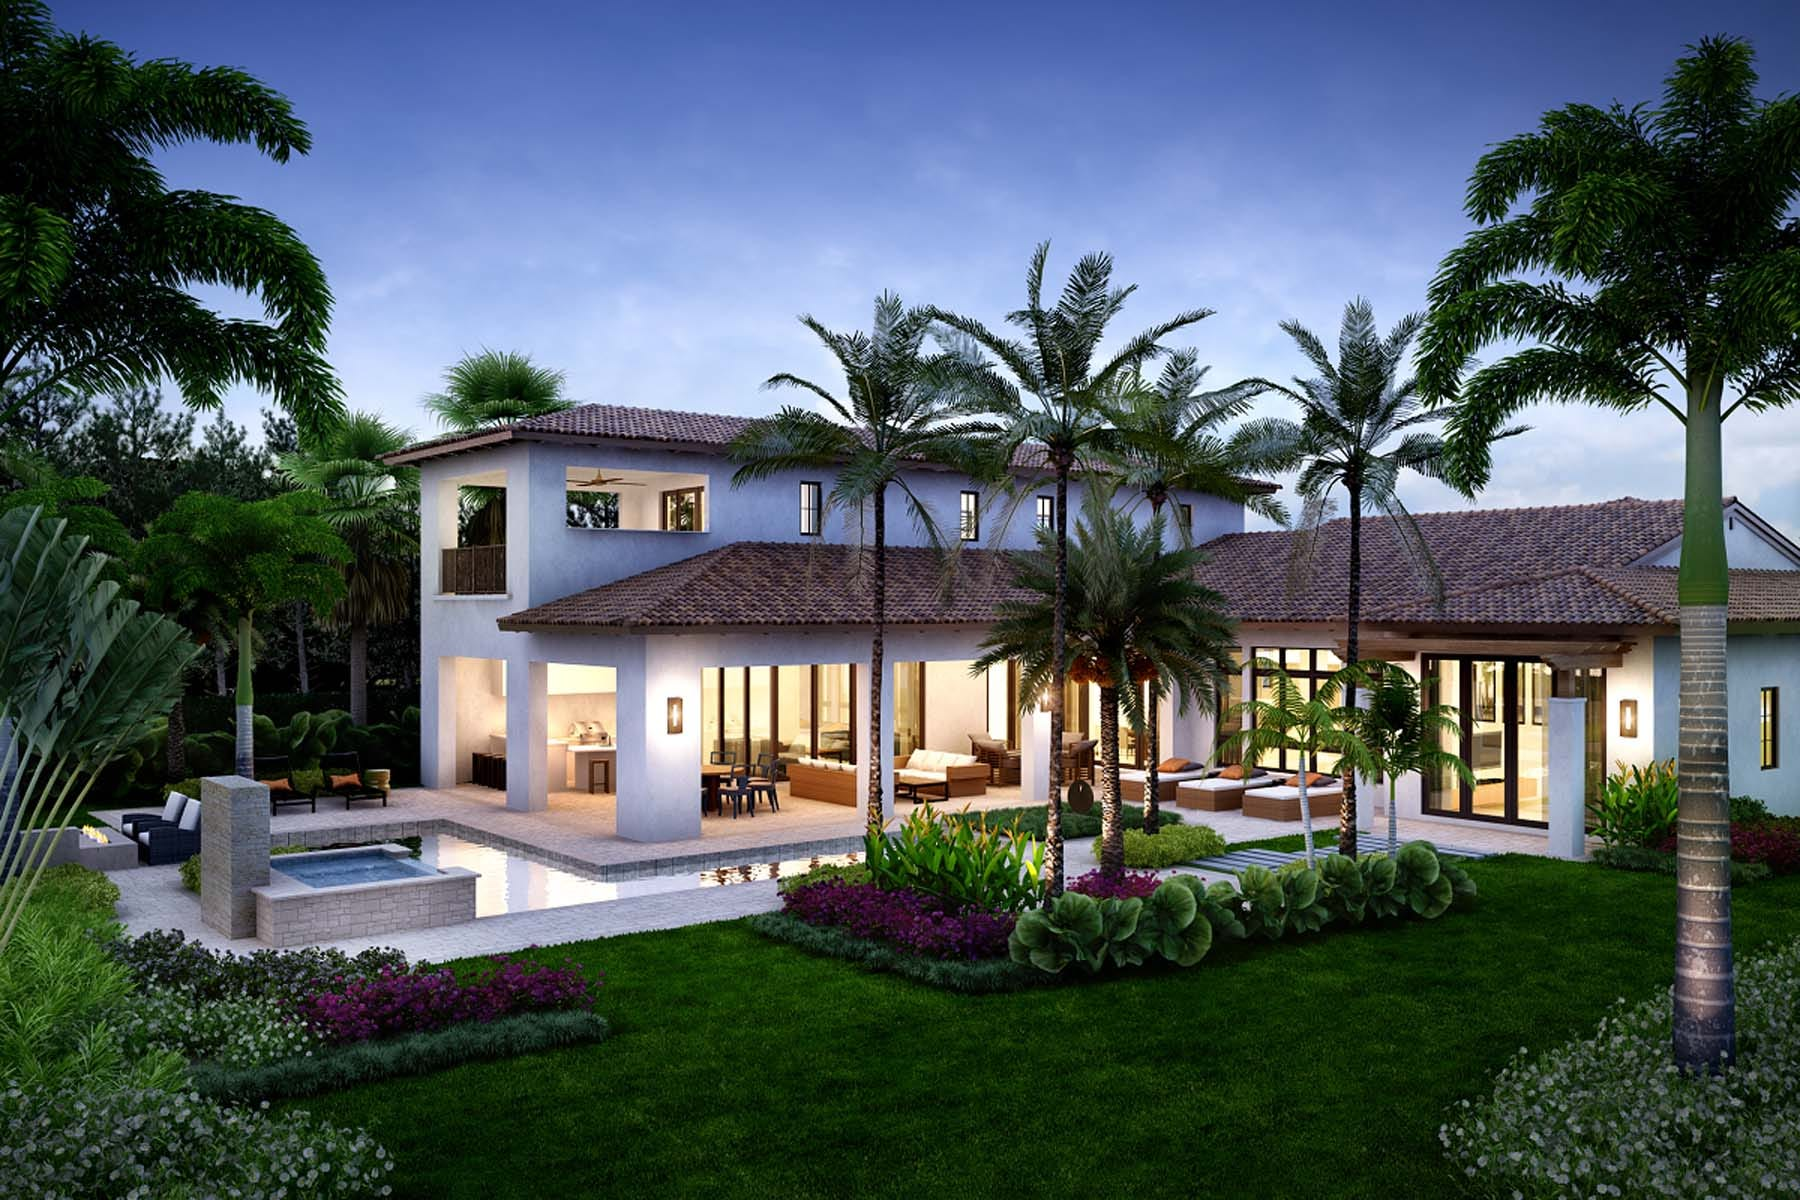 Catalina model home